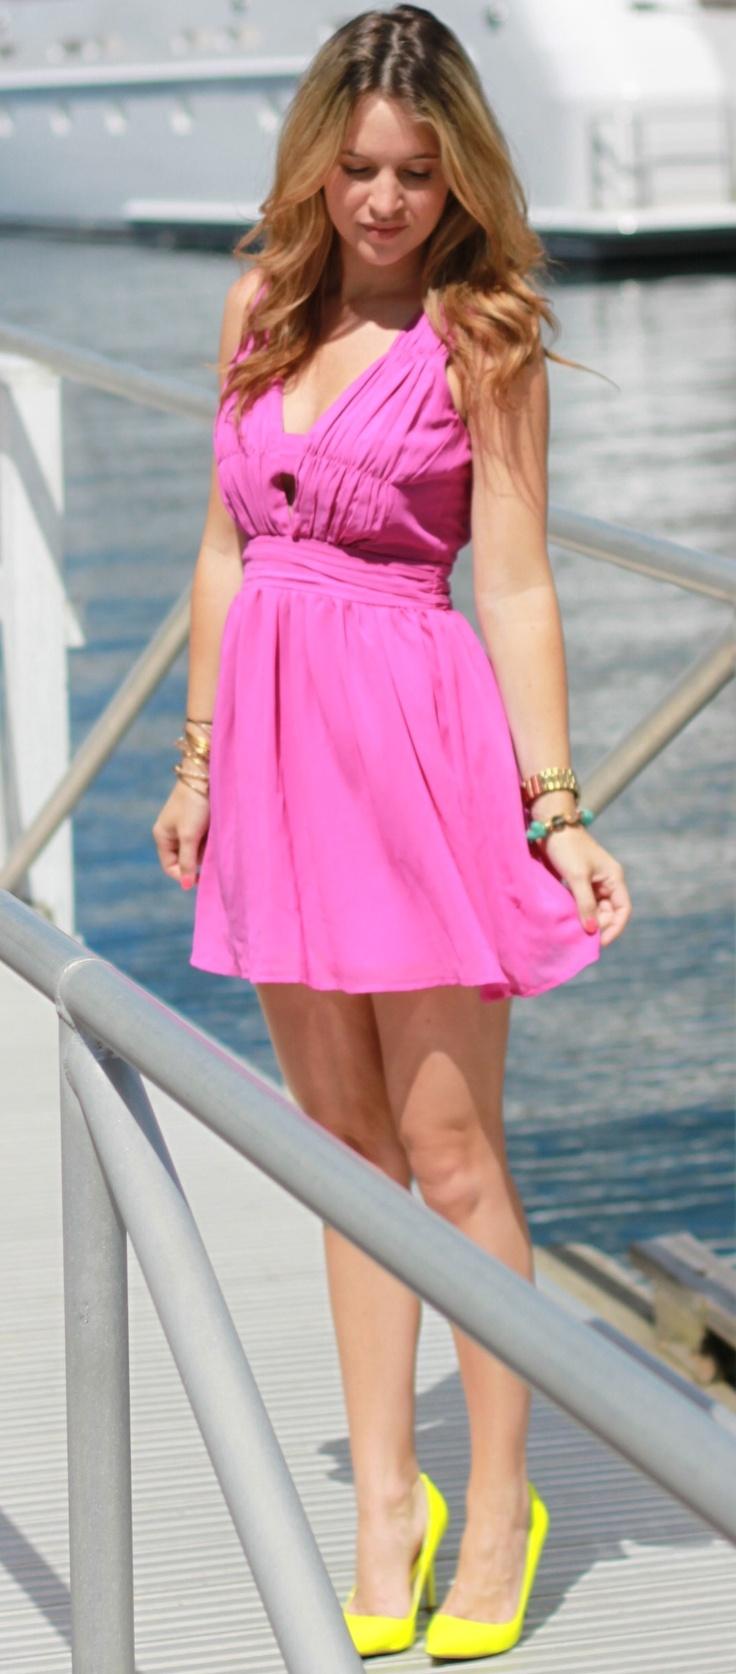 pink dress and yellow shoes dress uk